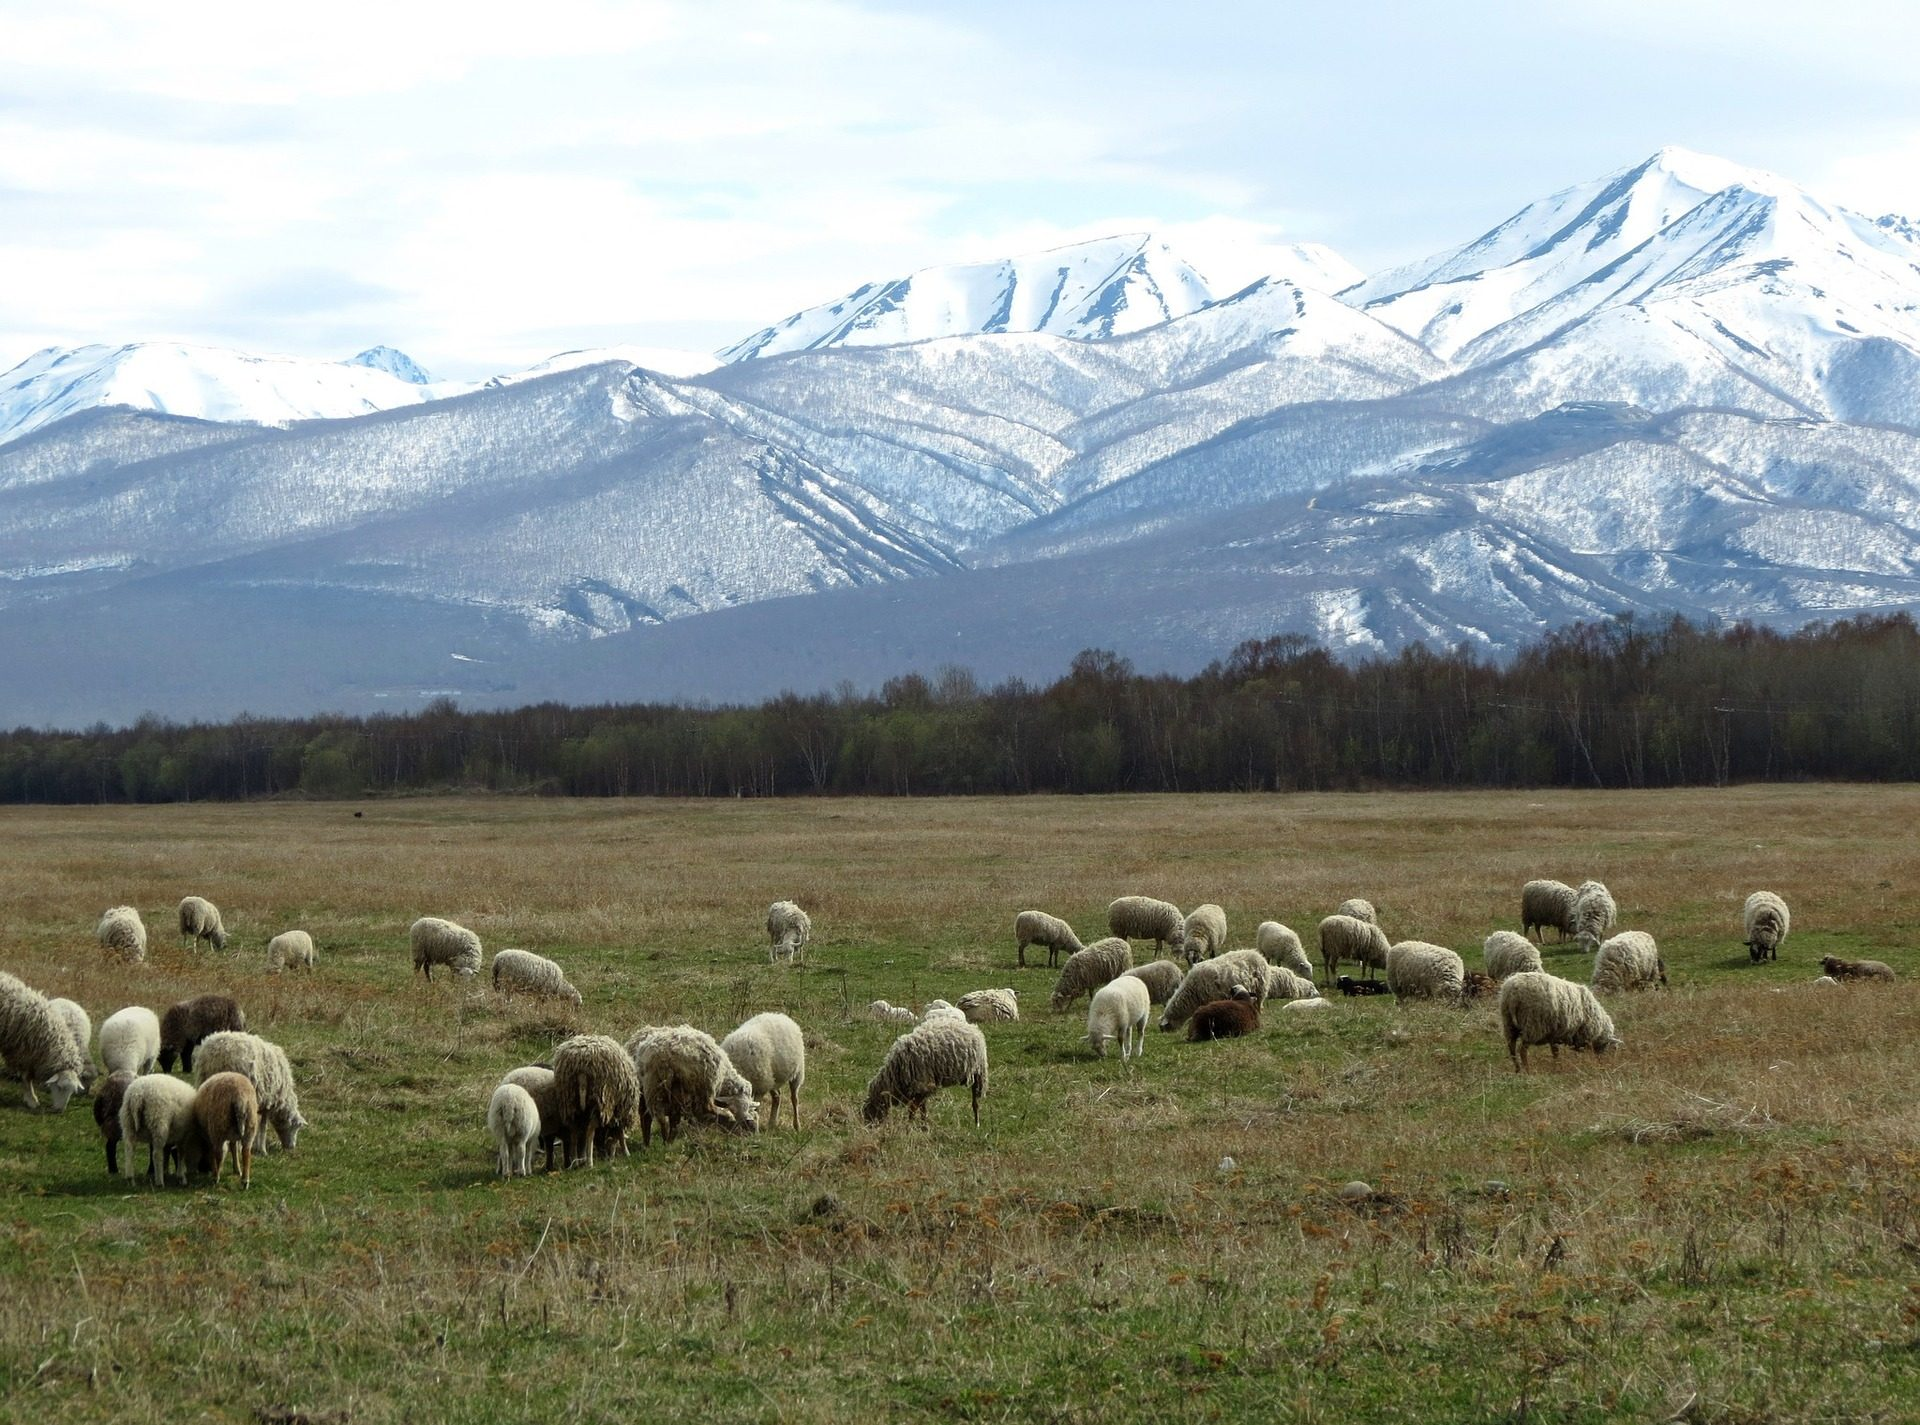 rebaño, ovejas, pastar, montañas, nevadas - Fondos de Pantalla HD - professor-falken.com